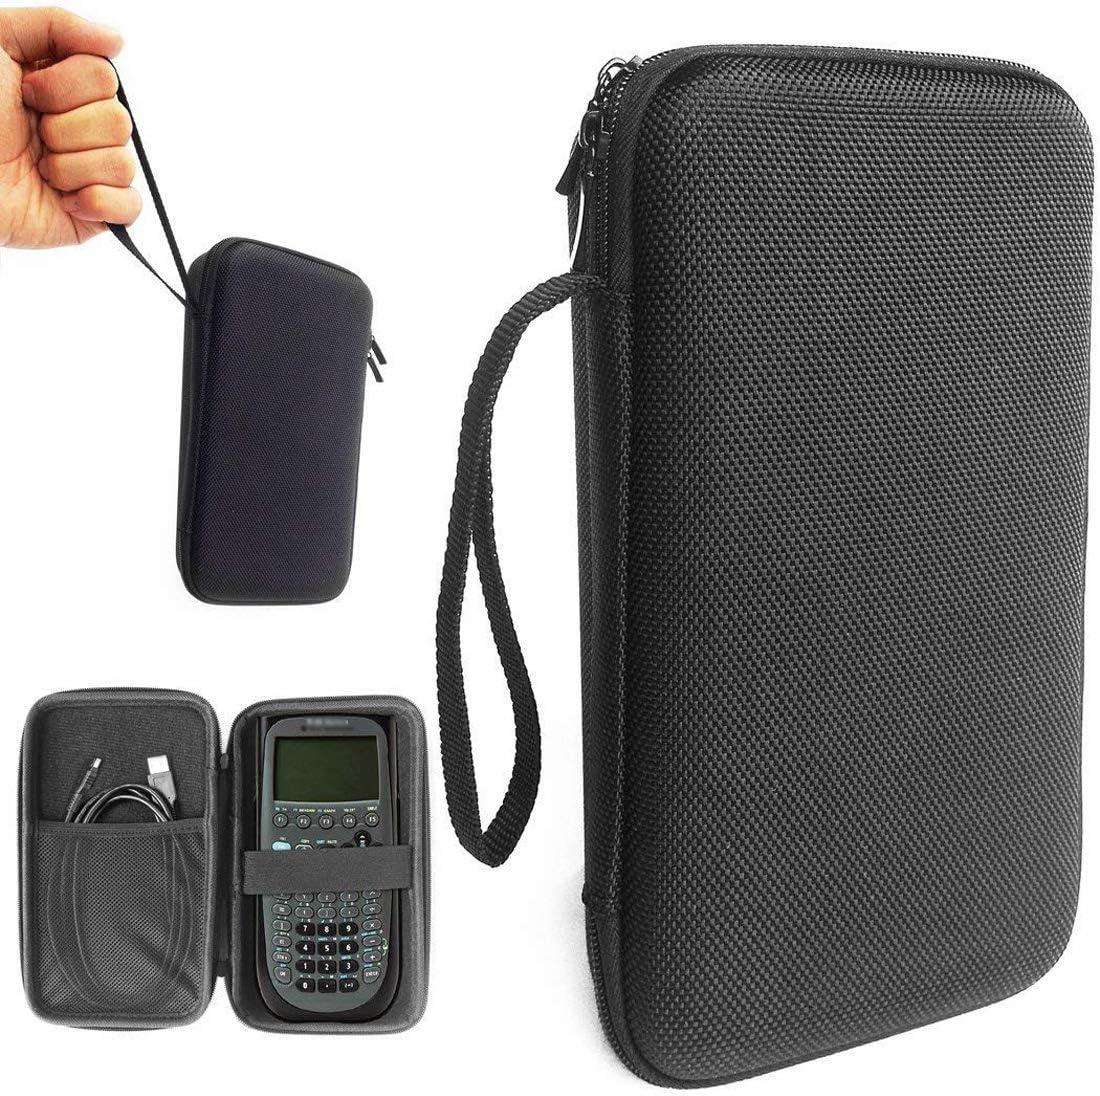 FitSand (TM) estuche de estuche de Carry cremallera duro EVA Almacenamiento Portátil Protector Caja de viaje para Texas Instruments Ti-89 titanio programable, Texas Instruments, Casio, HP, SainSmart – Calculadora gráfica: Amazon.es: Electrónica